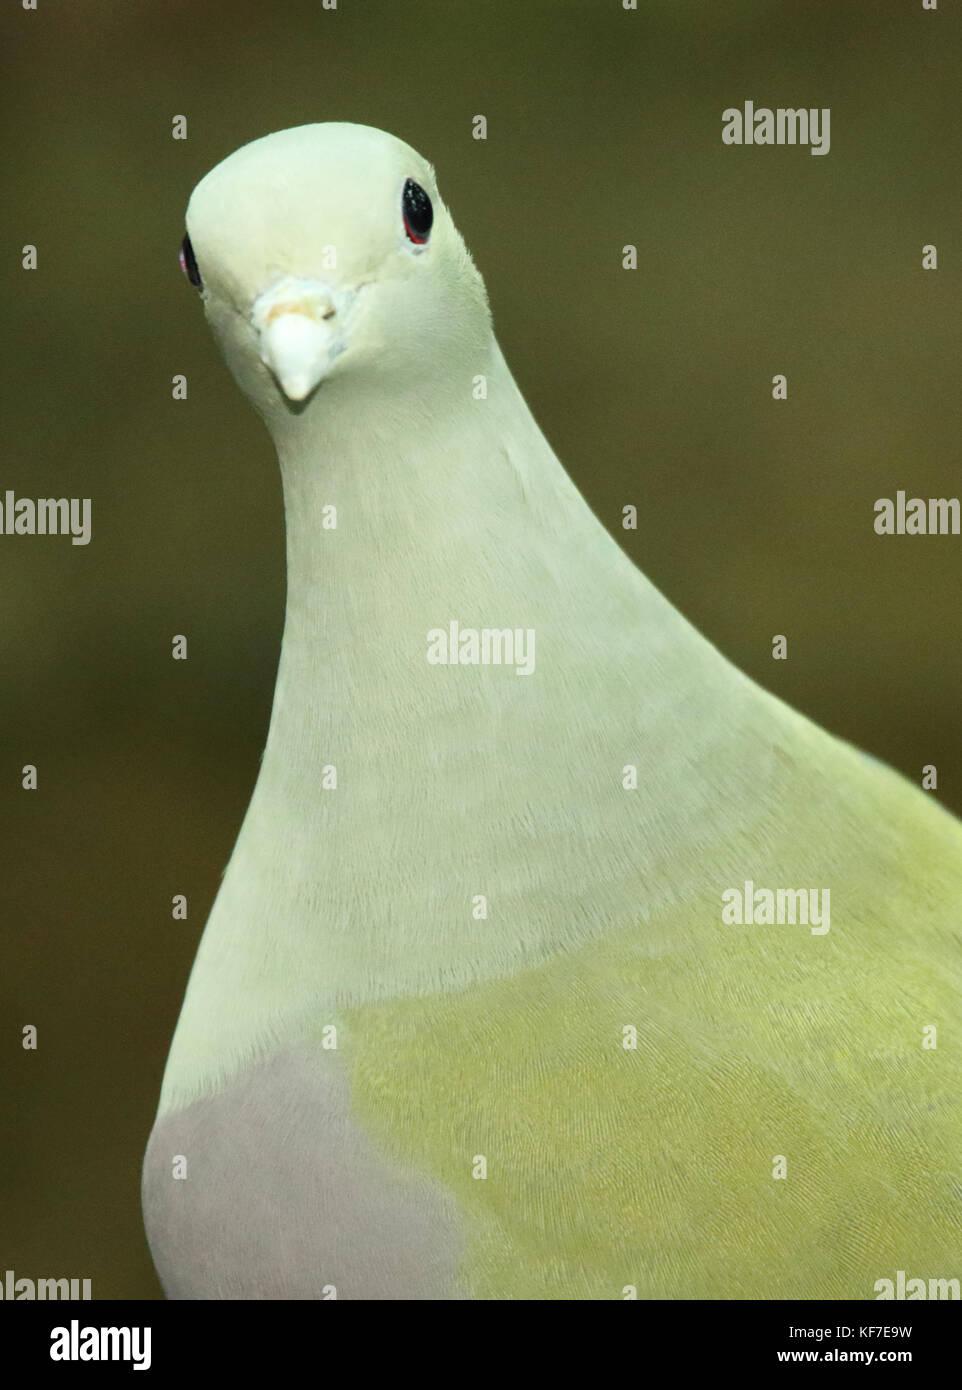 Un retrato de bruce green pigeon asomarse. Imagen De Stock